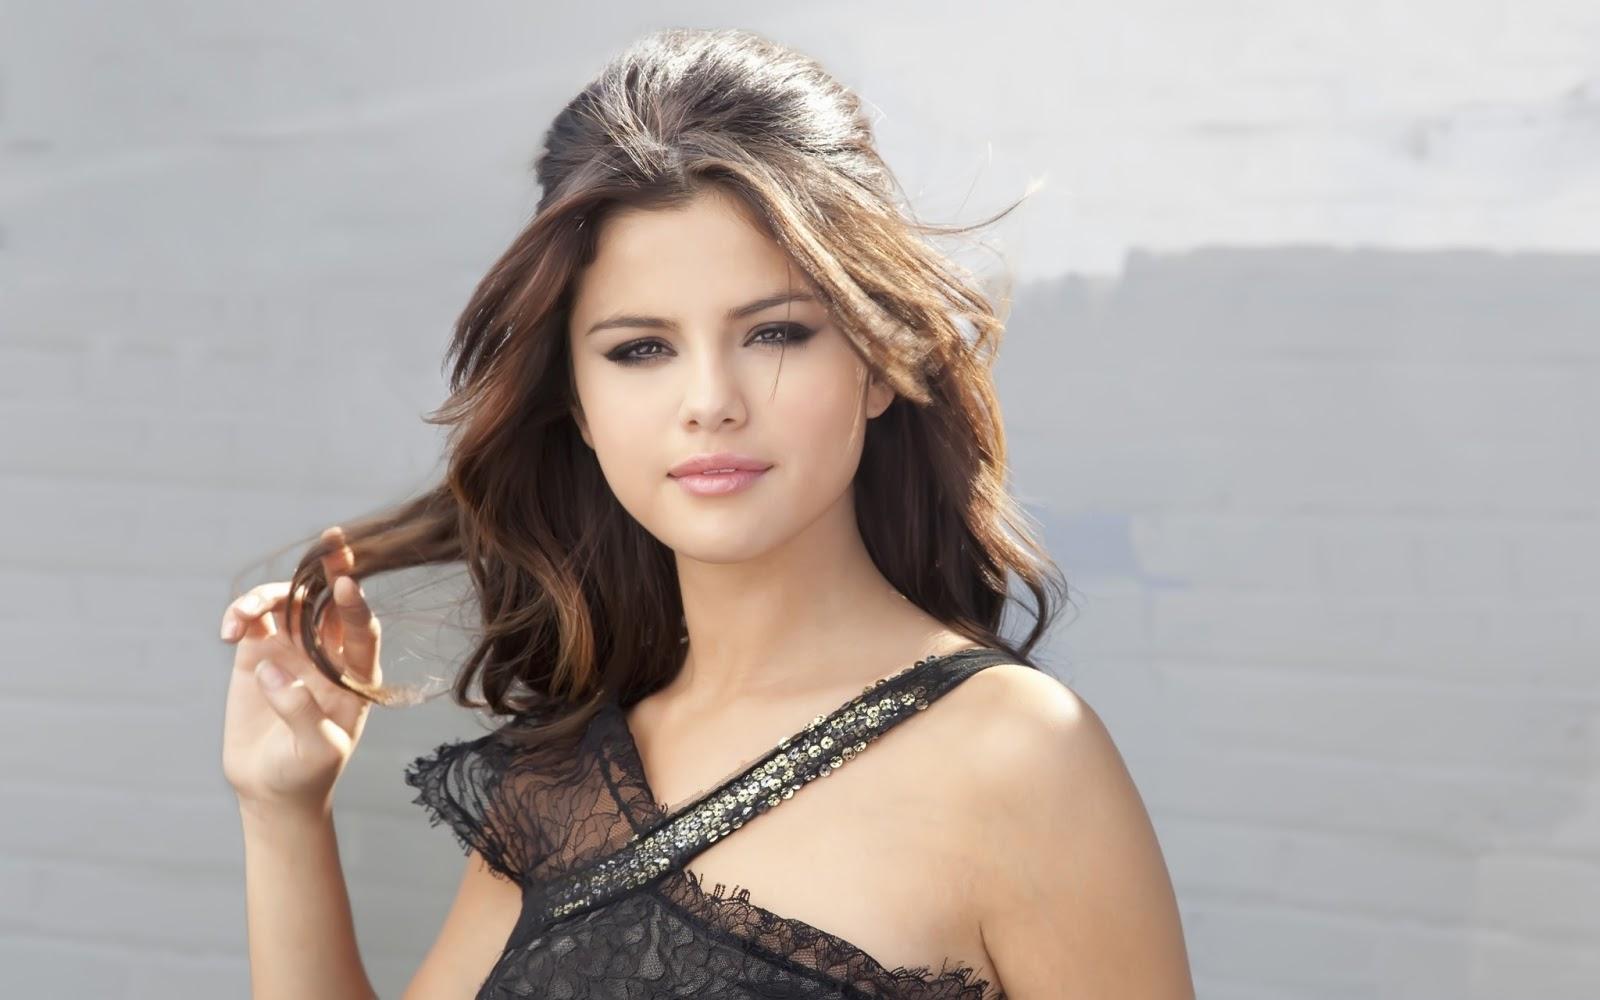 Selena Gomez Wallpaper 1600x1000